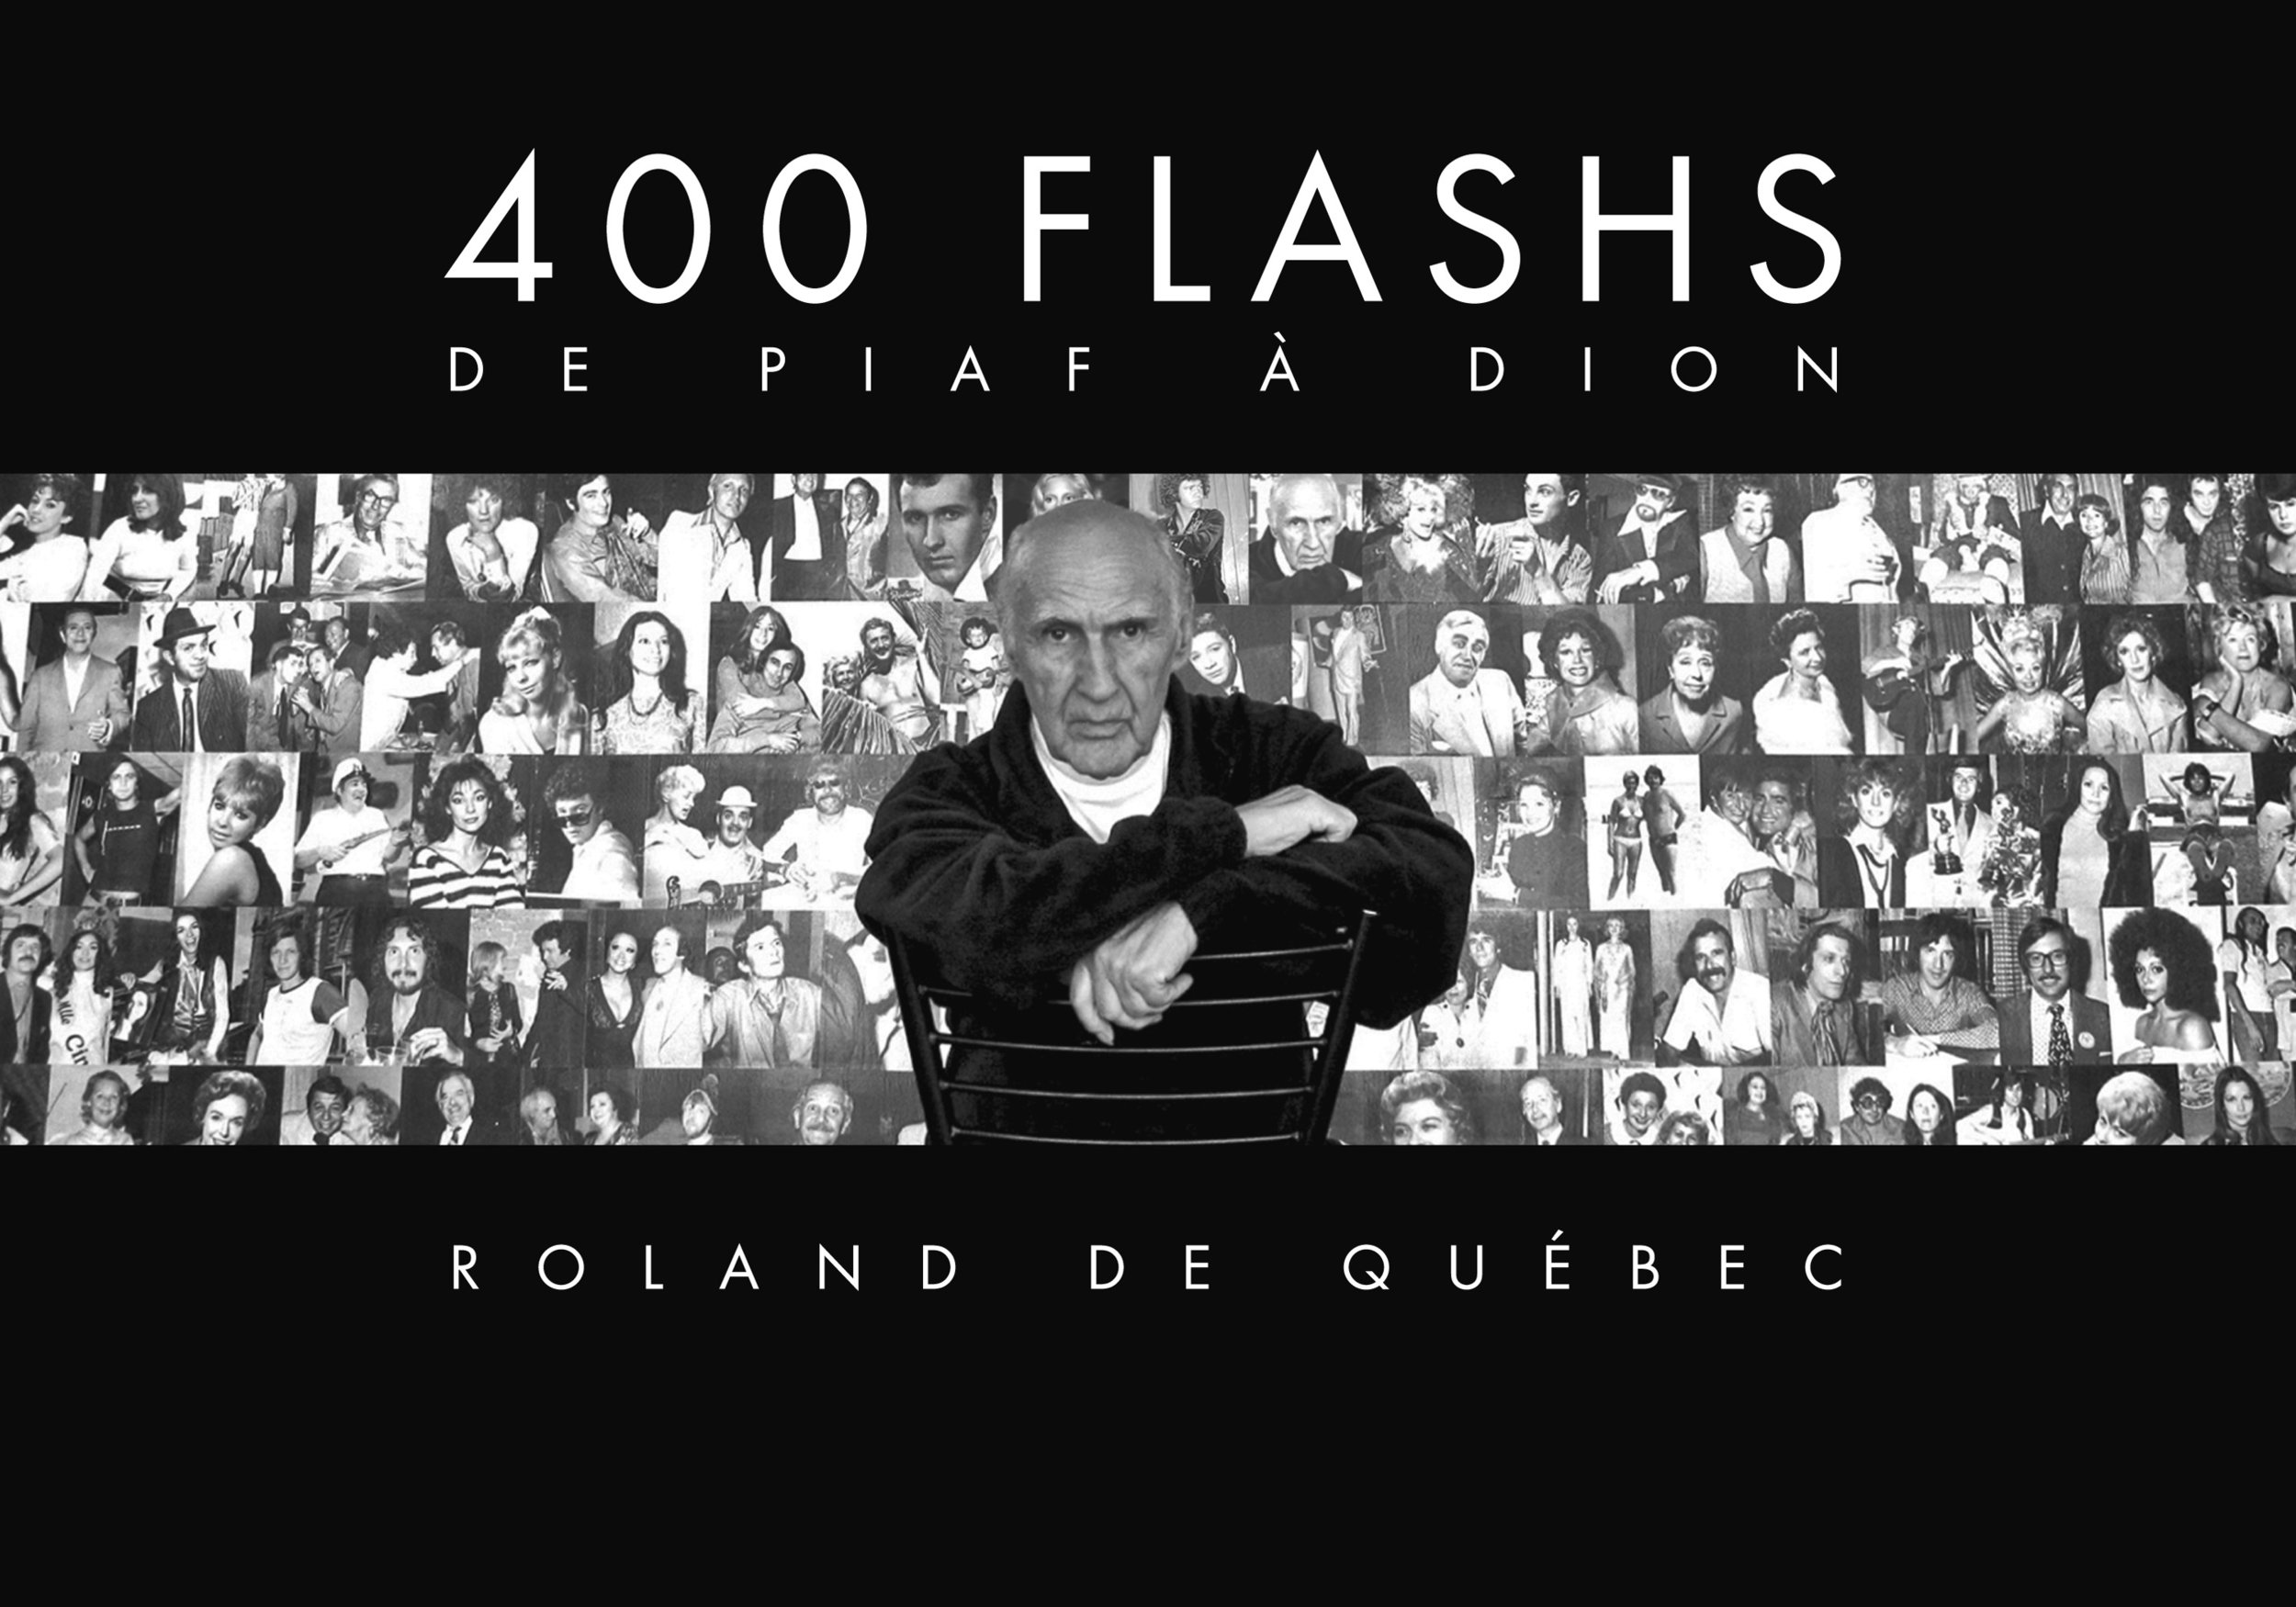 400_Flashs_-_couvert_1_(300dpi).jpg